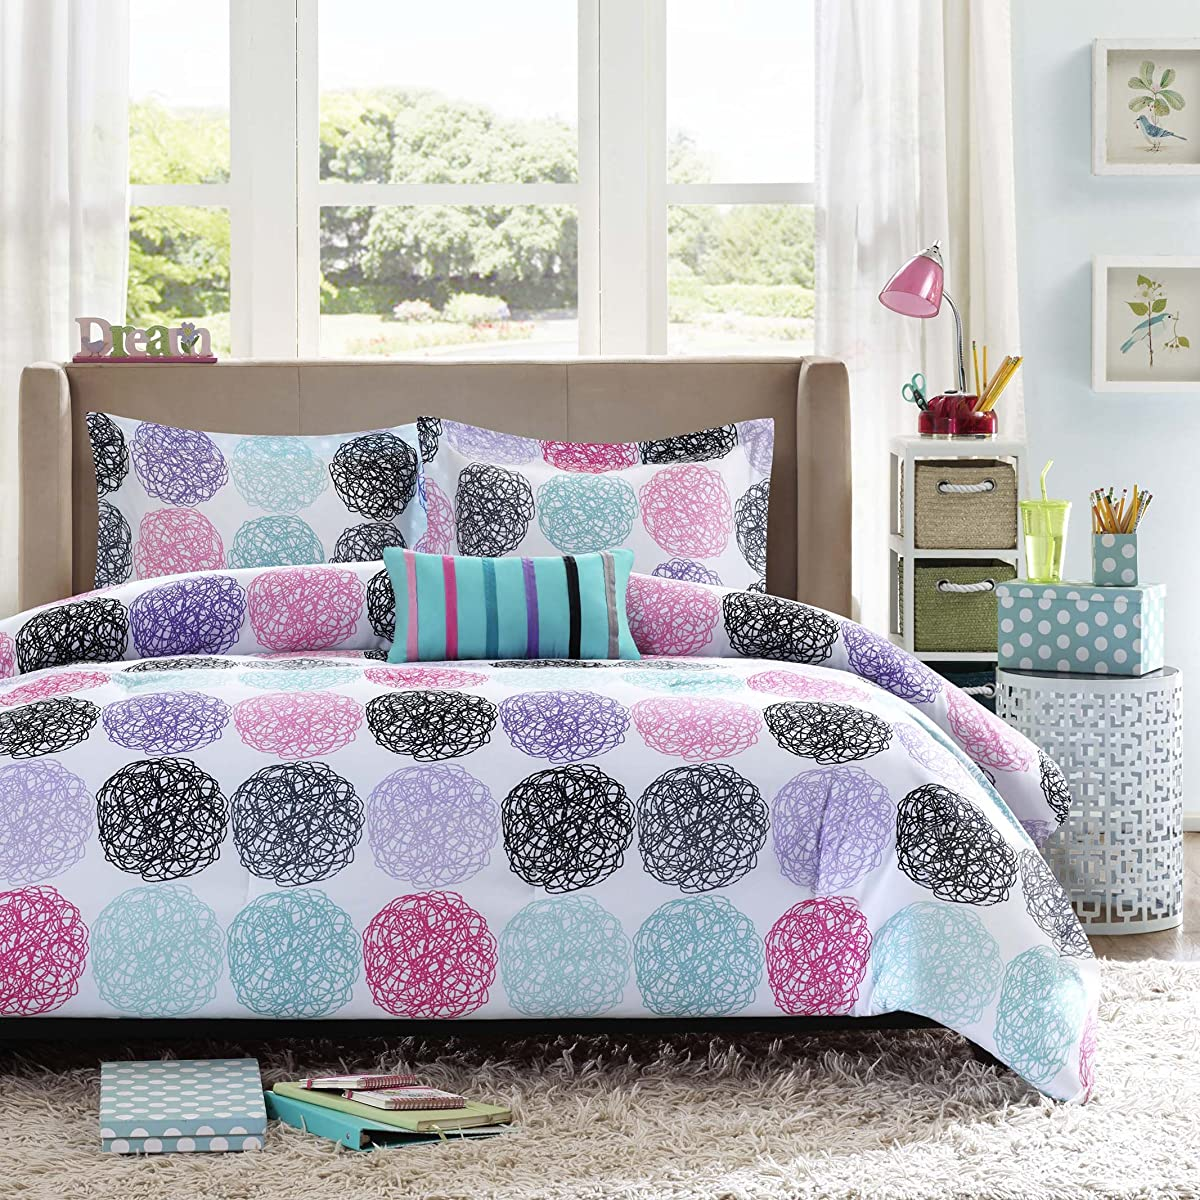 Mizone Carly 4 Piece Comforter Set, Full/Queen, Purple